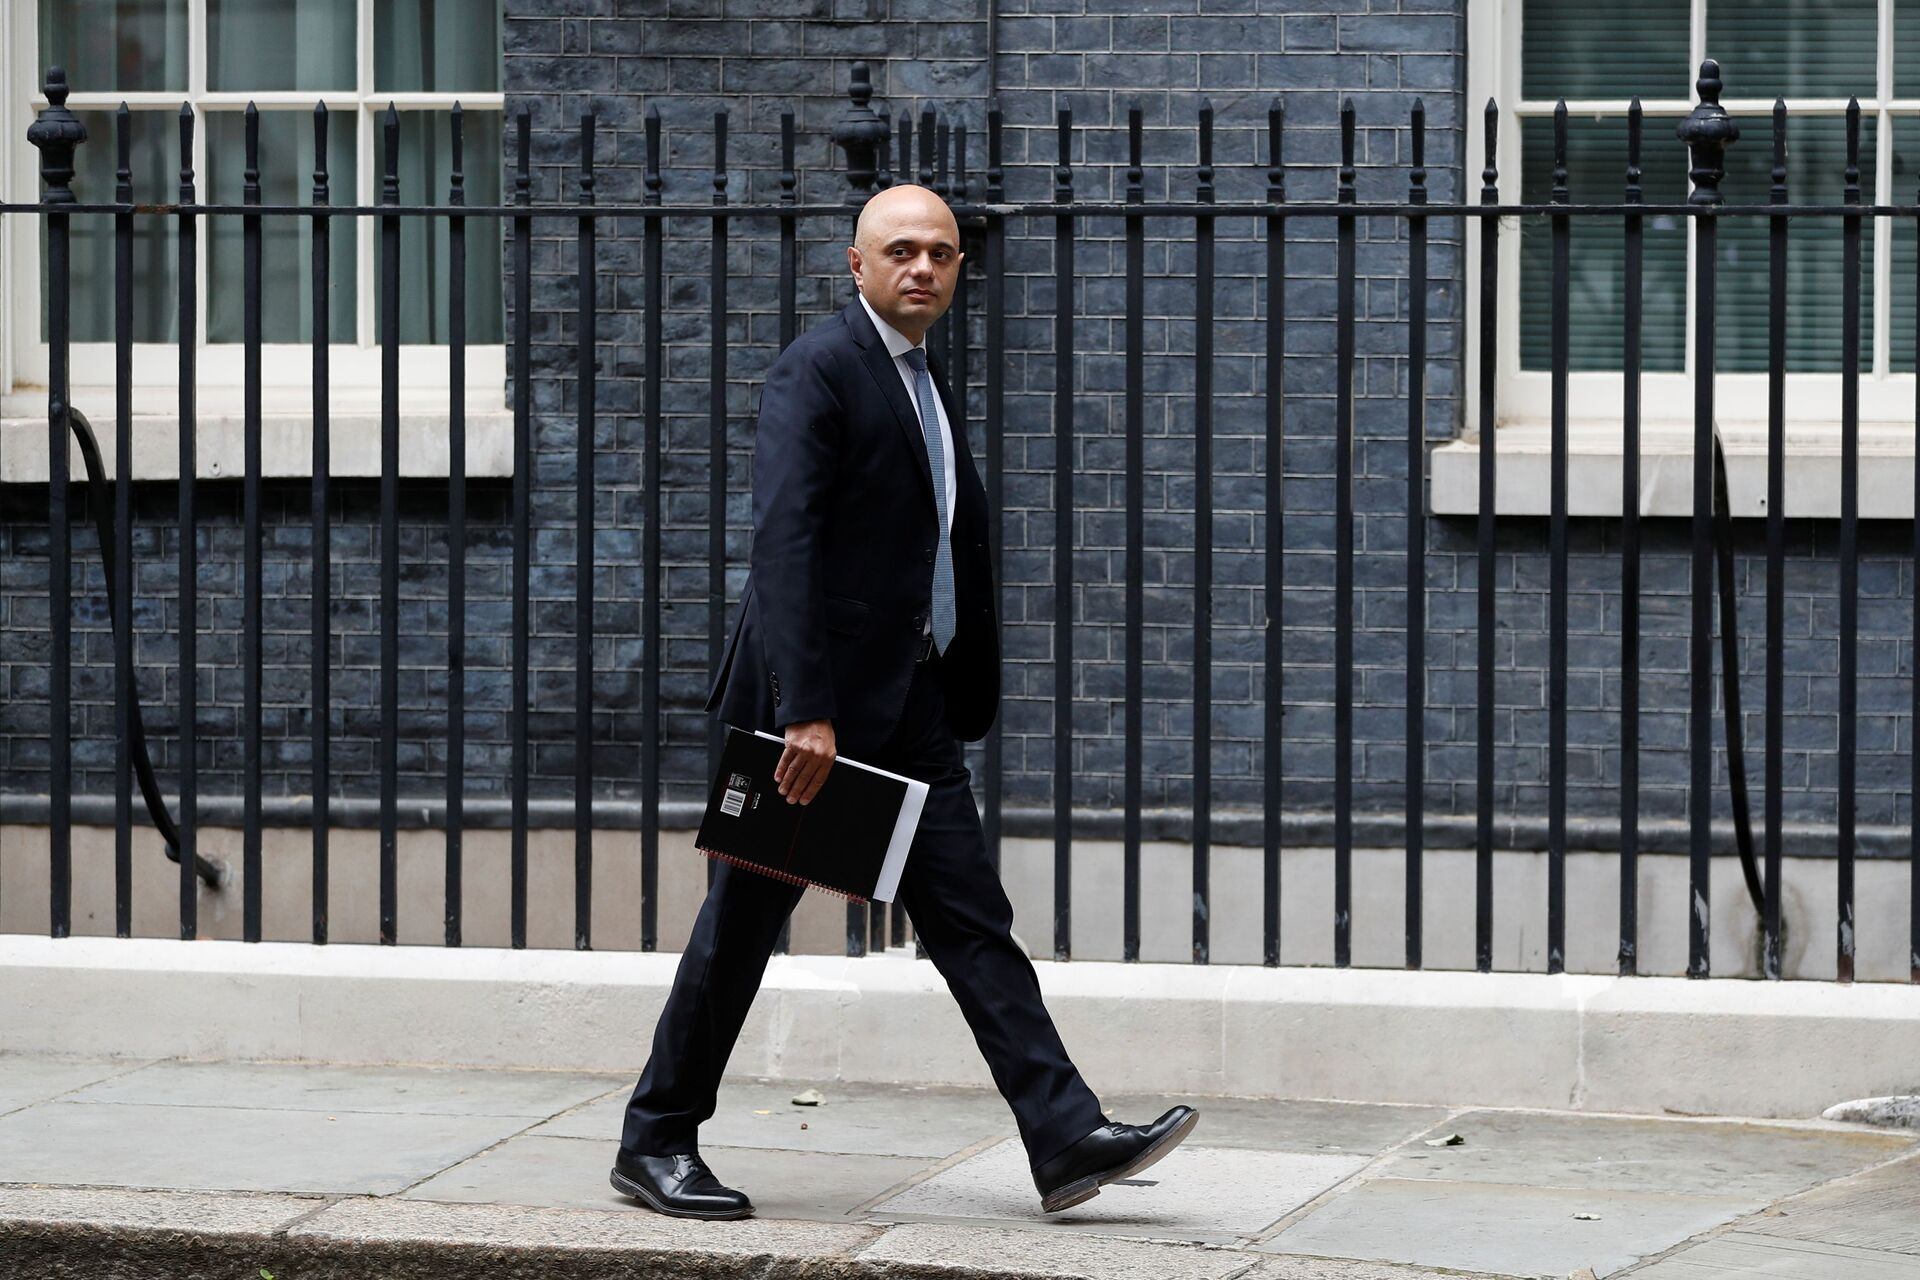 Britain's Health Secretary Sajid Javid walks on Downing Street in London, Britain, July 14, 2021 - Sputnik International, 1920, 07.09.2021